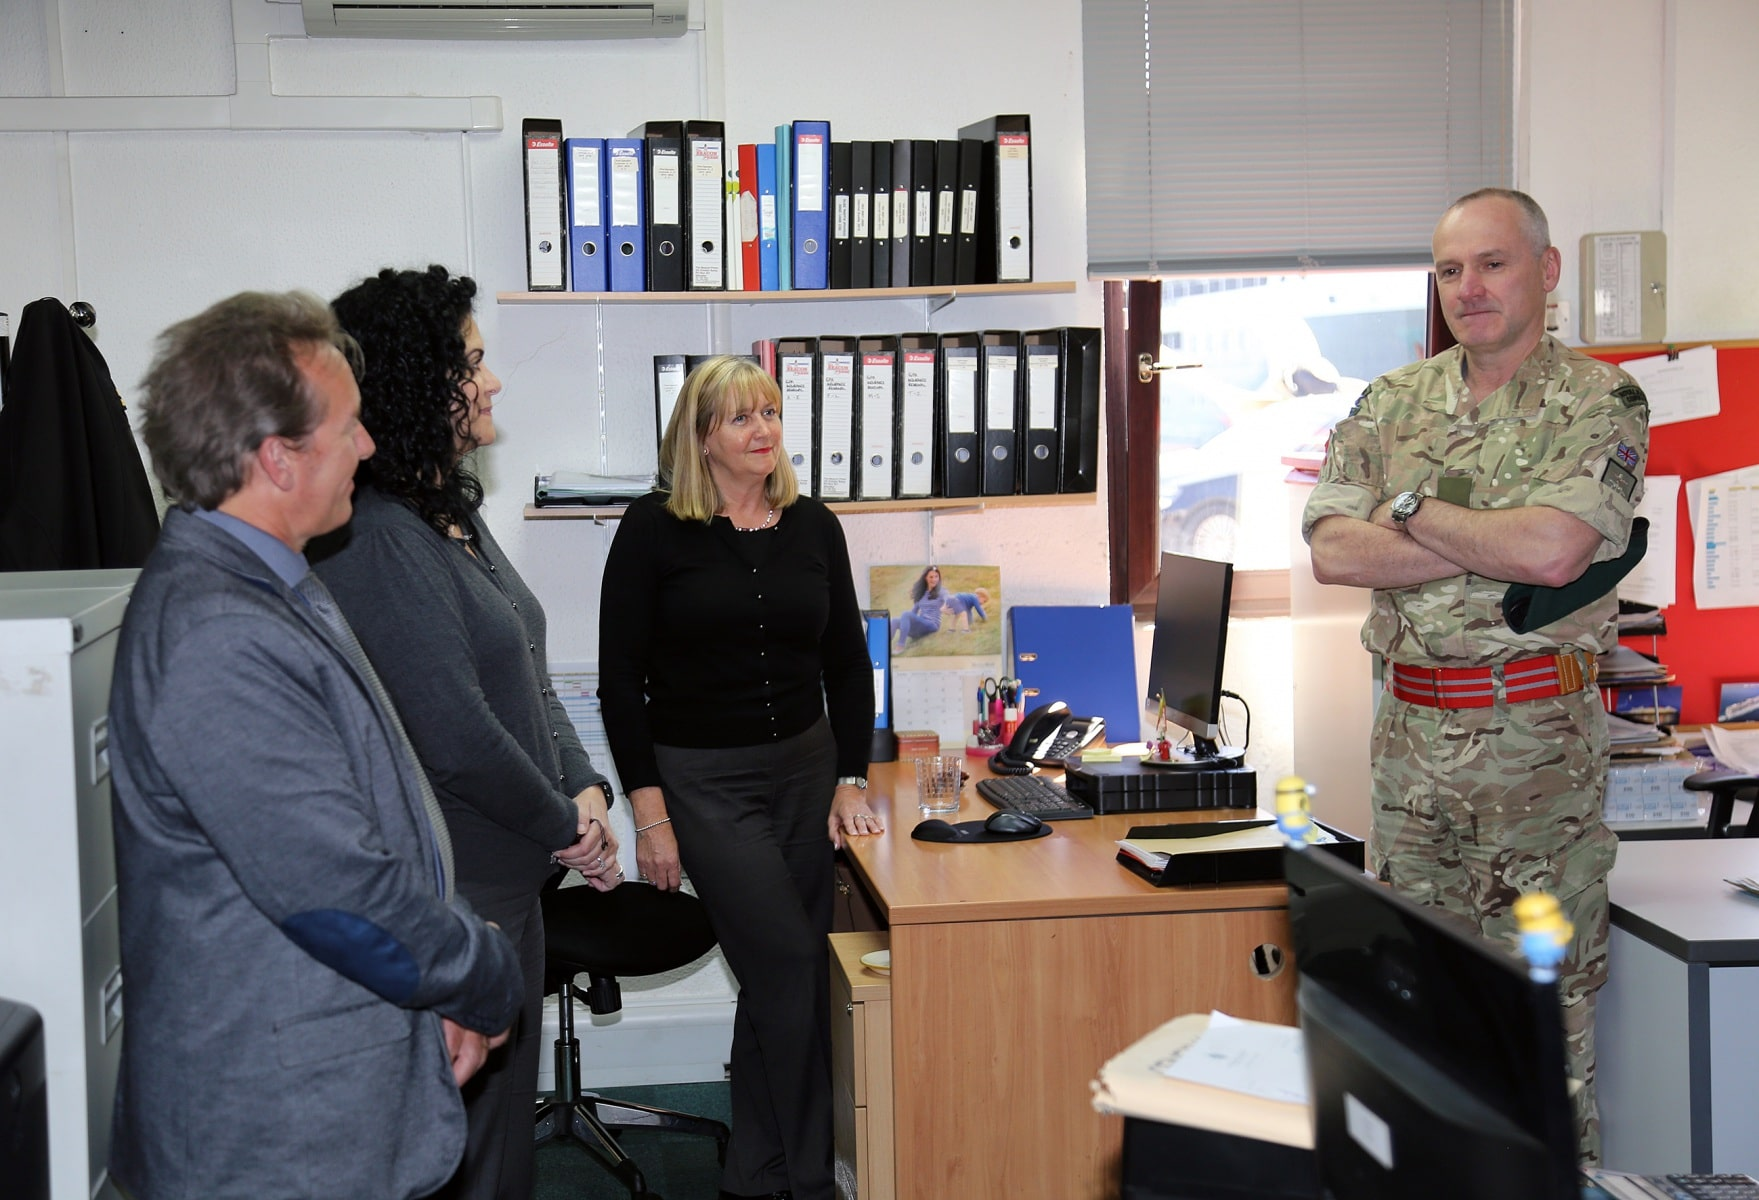 visita-oficial-del-gobernador-al-puerto-de-gibraltar_26154508855_o